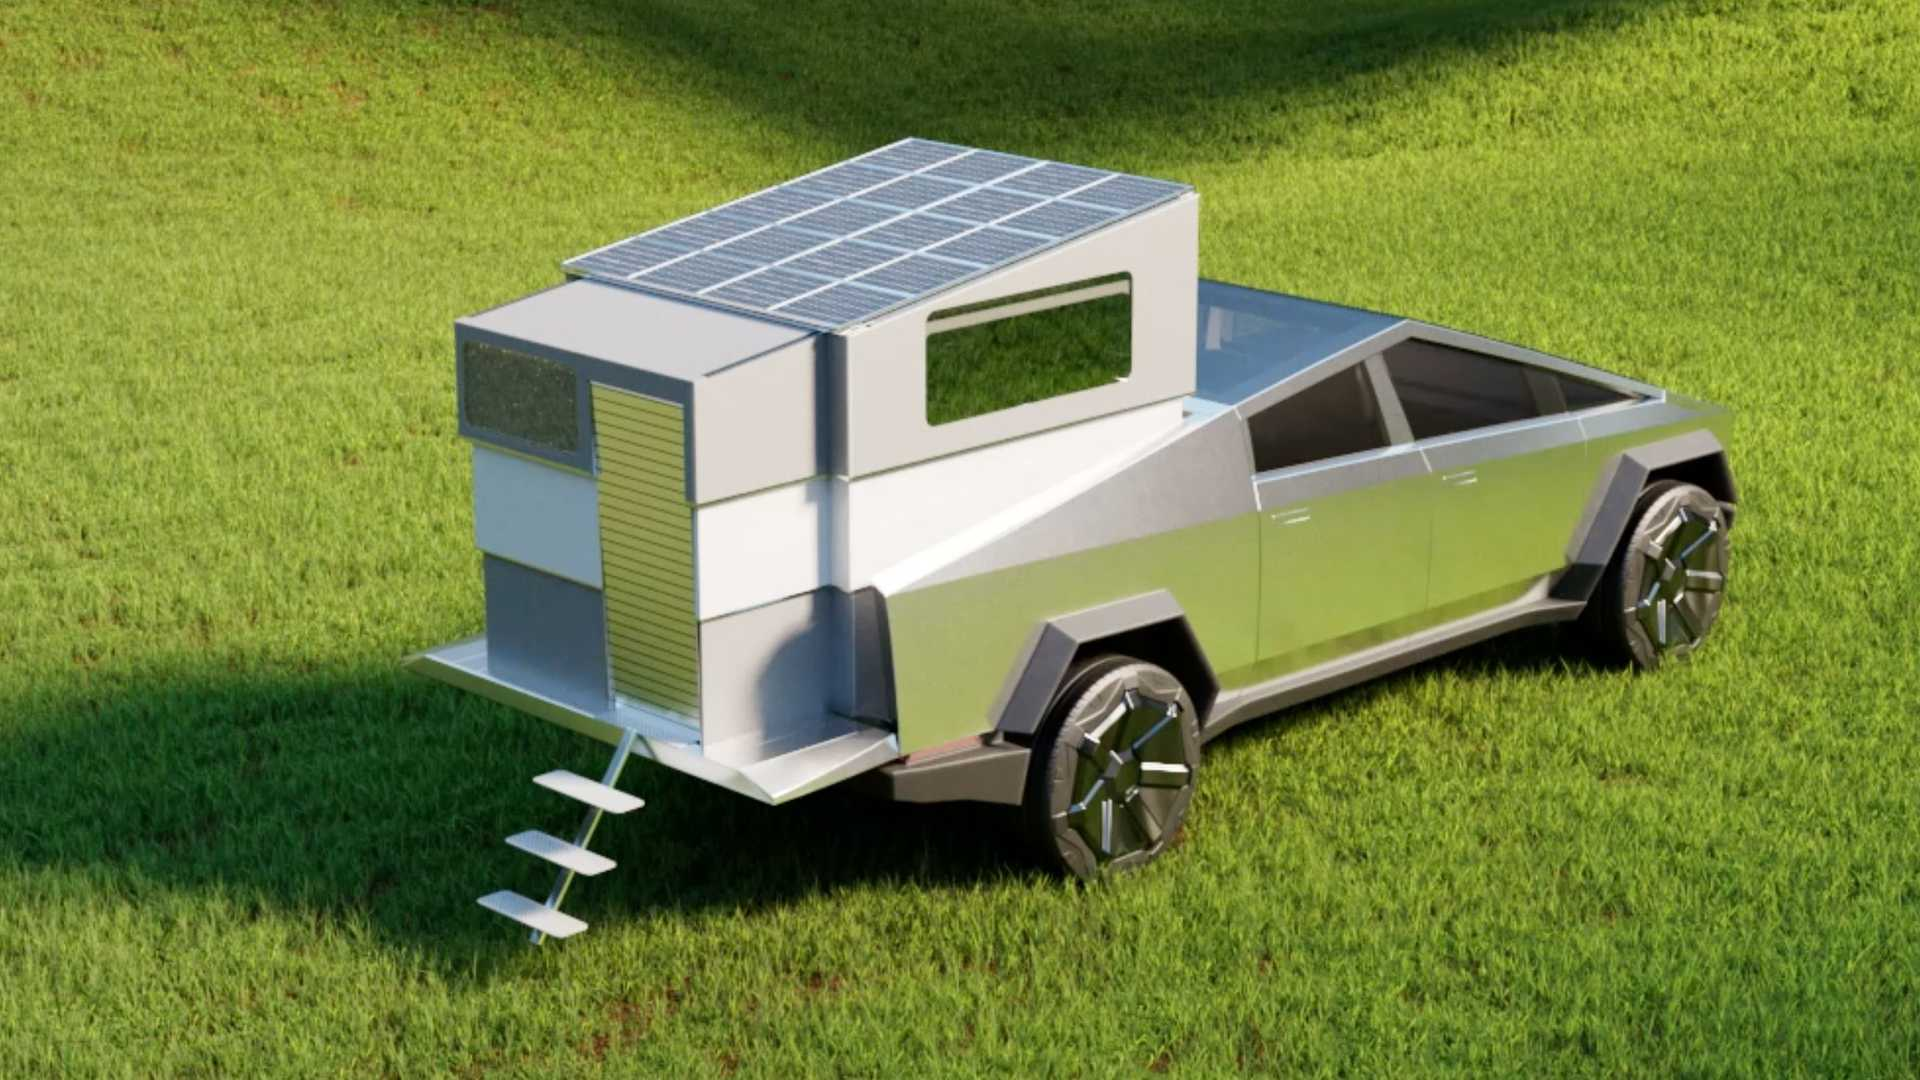 https://cdn.motor1.com/images/mgl/POvrG/s6/cyberlandr-truck-camper-for-tesla-cybertruck-extending.jpg